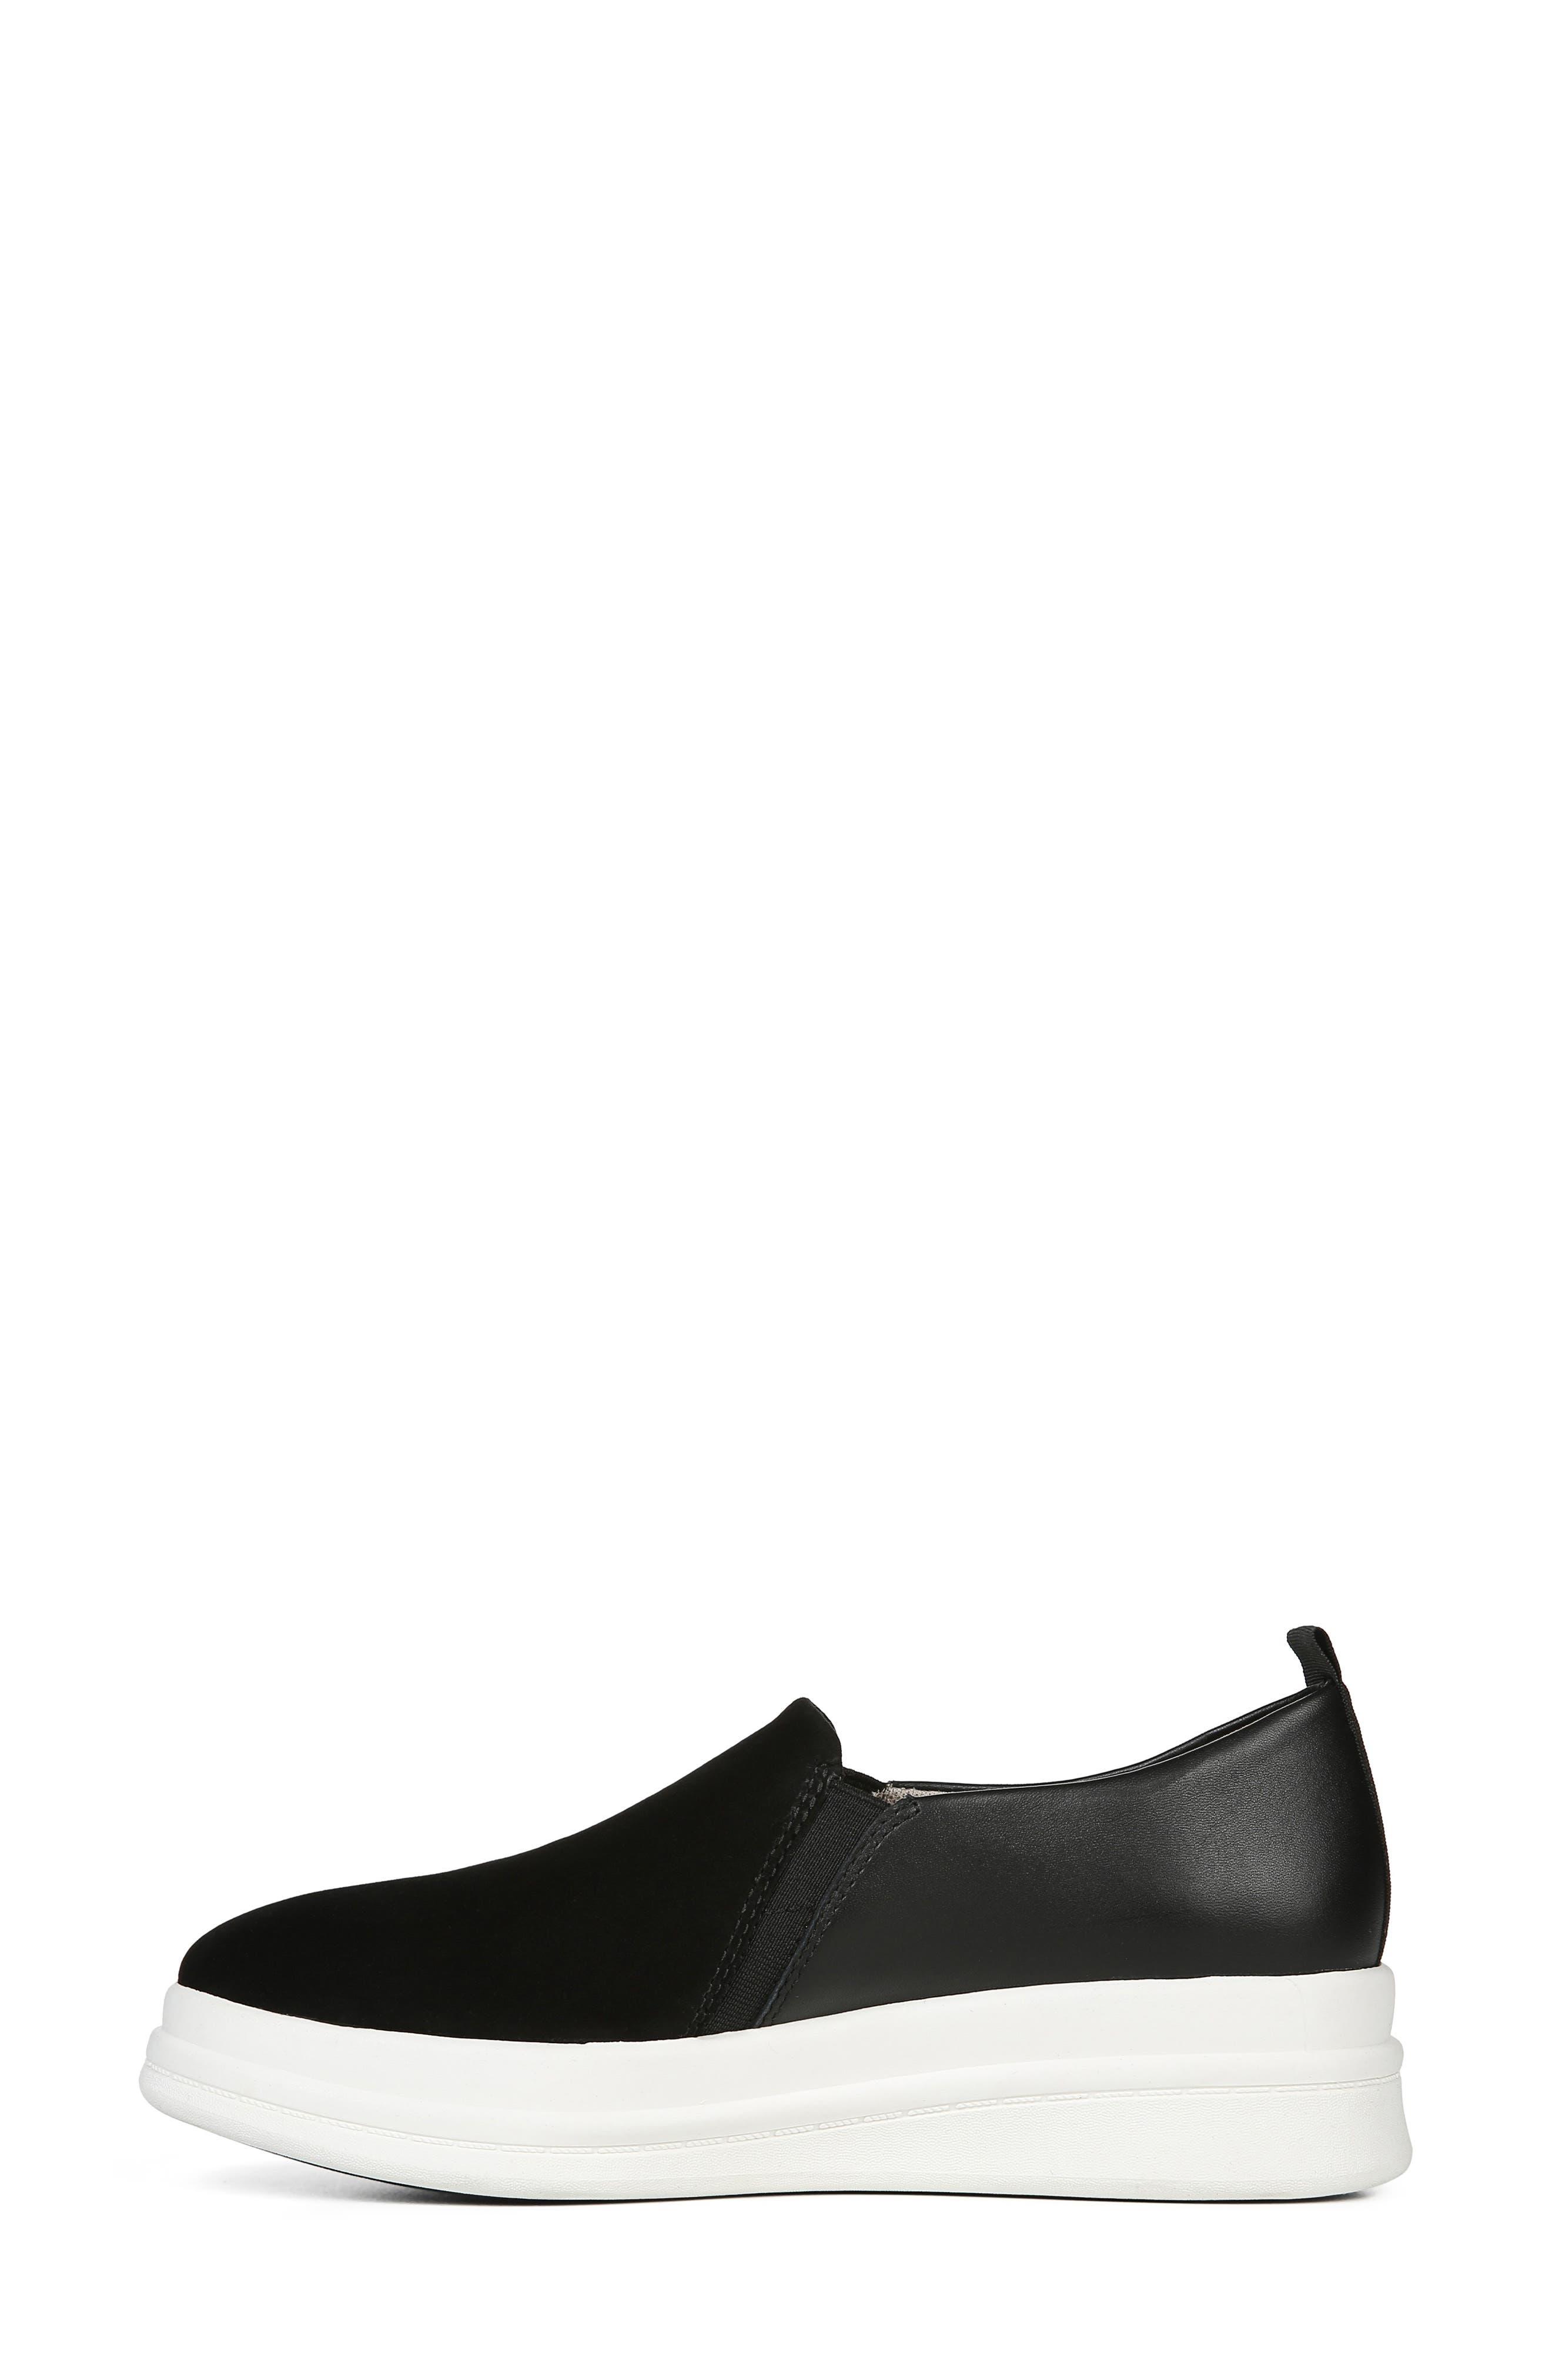 ,                             Yola Slip-On Sneaker,                             Alternate thumbnail 8, color,                             BLACK SUEDE/ LEATHER